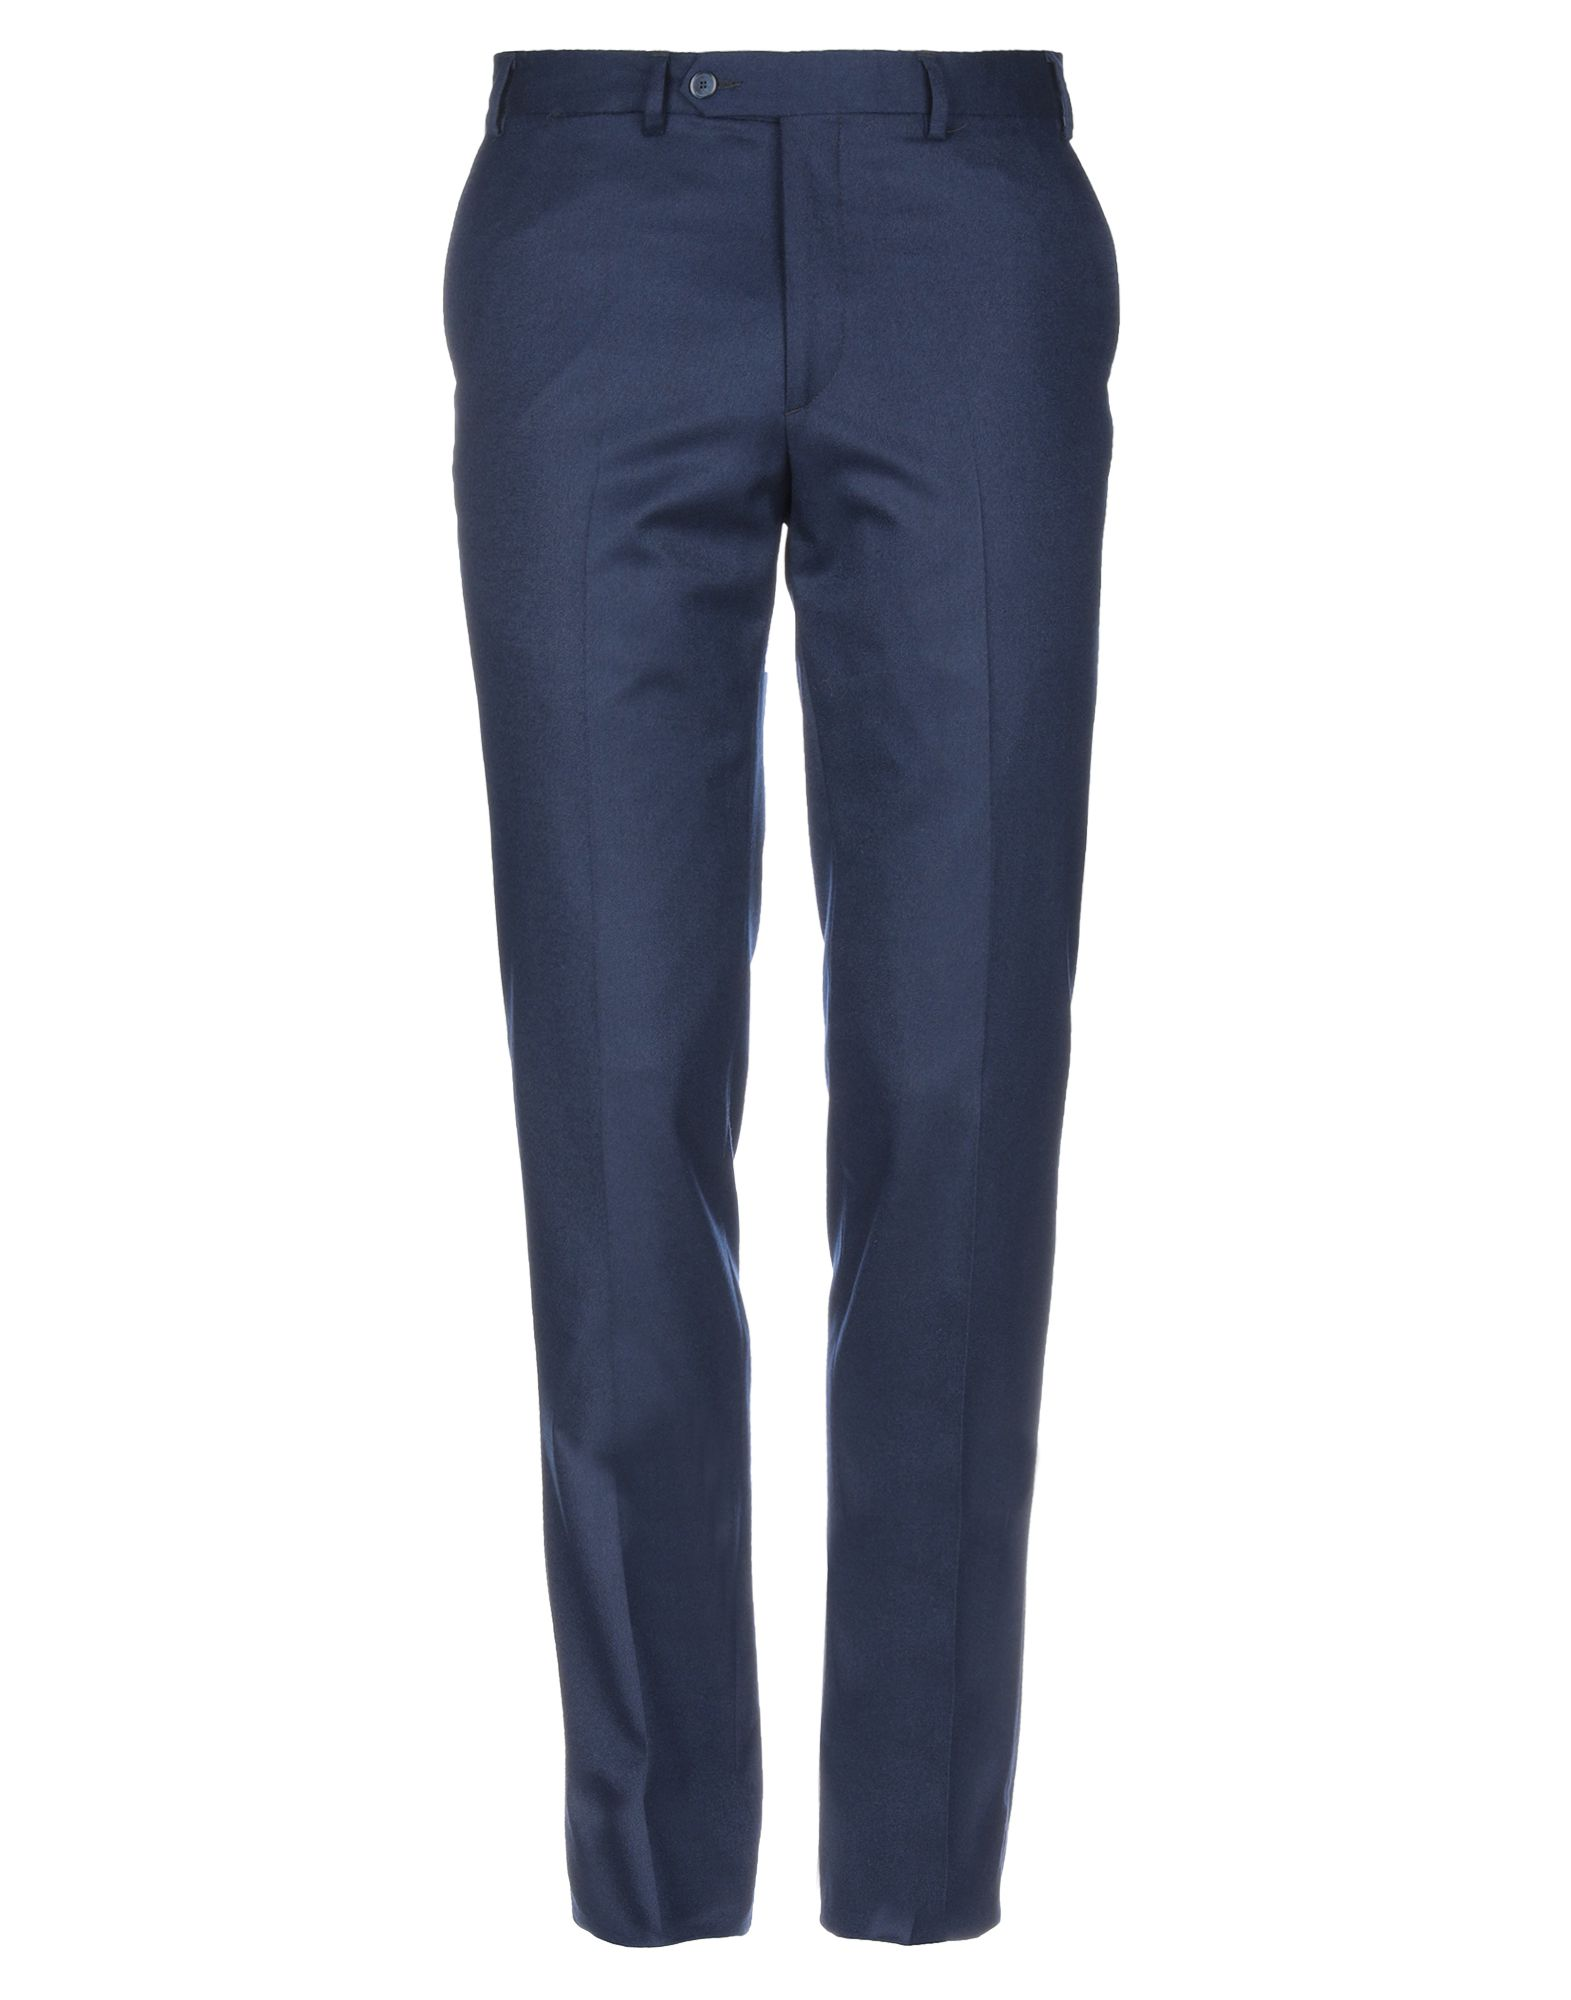 Фото - SARTORIA TOSCANA Повседневные брюки sartoria toscana повседневные брюки